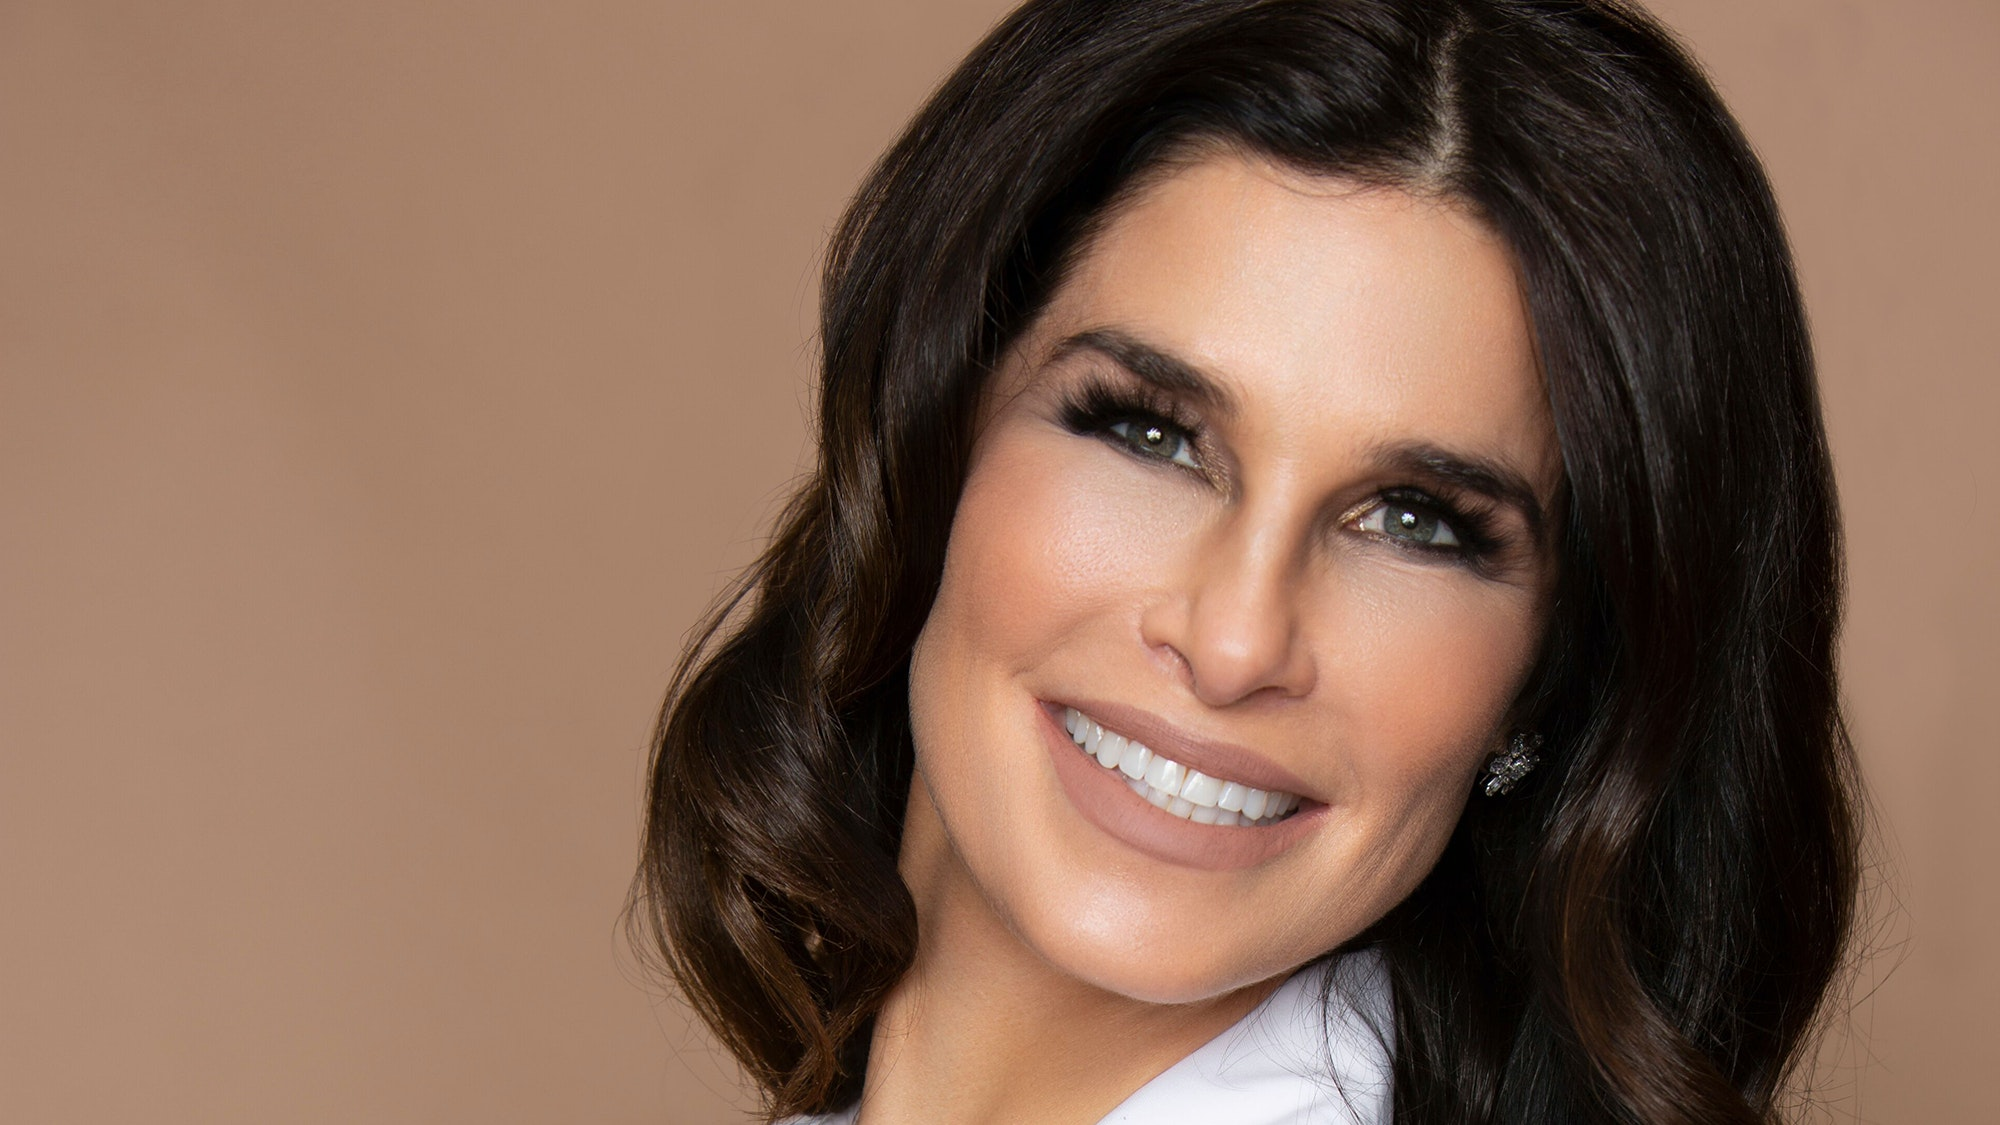 California Dermatologist Dr. Anna Guanche Talks Glossy Hair Secrets & the Treatments She Swears By